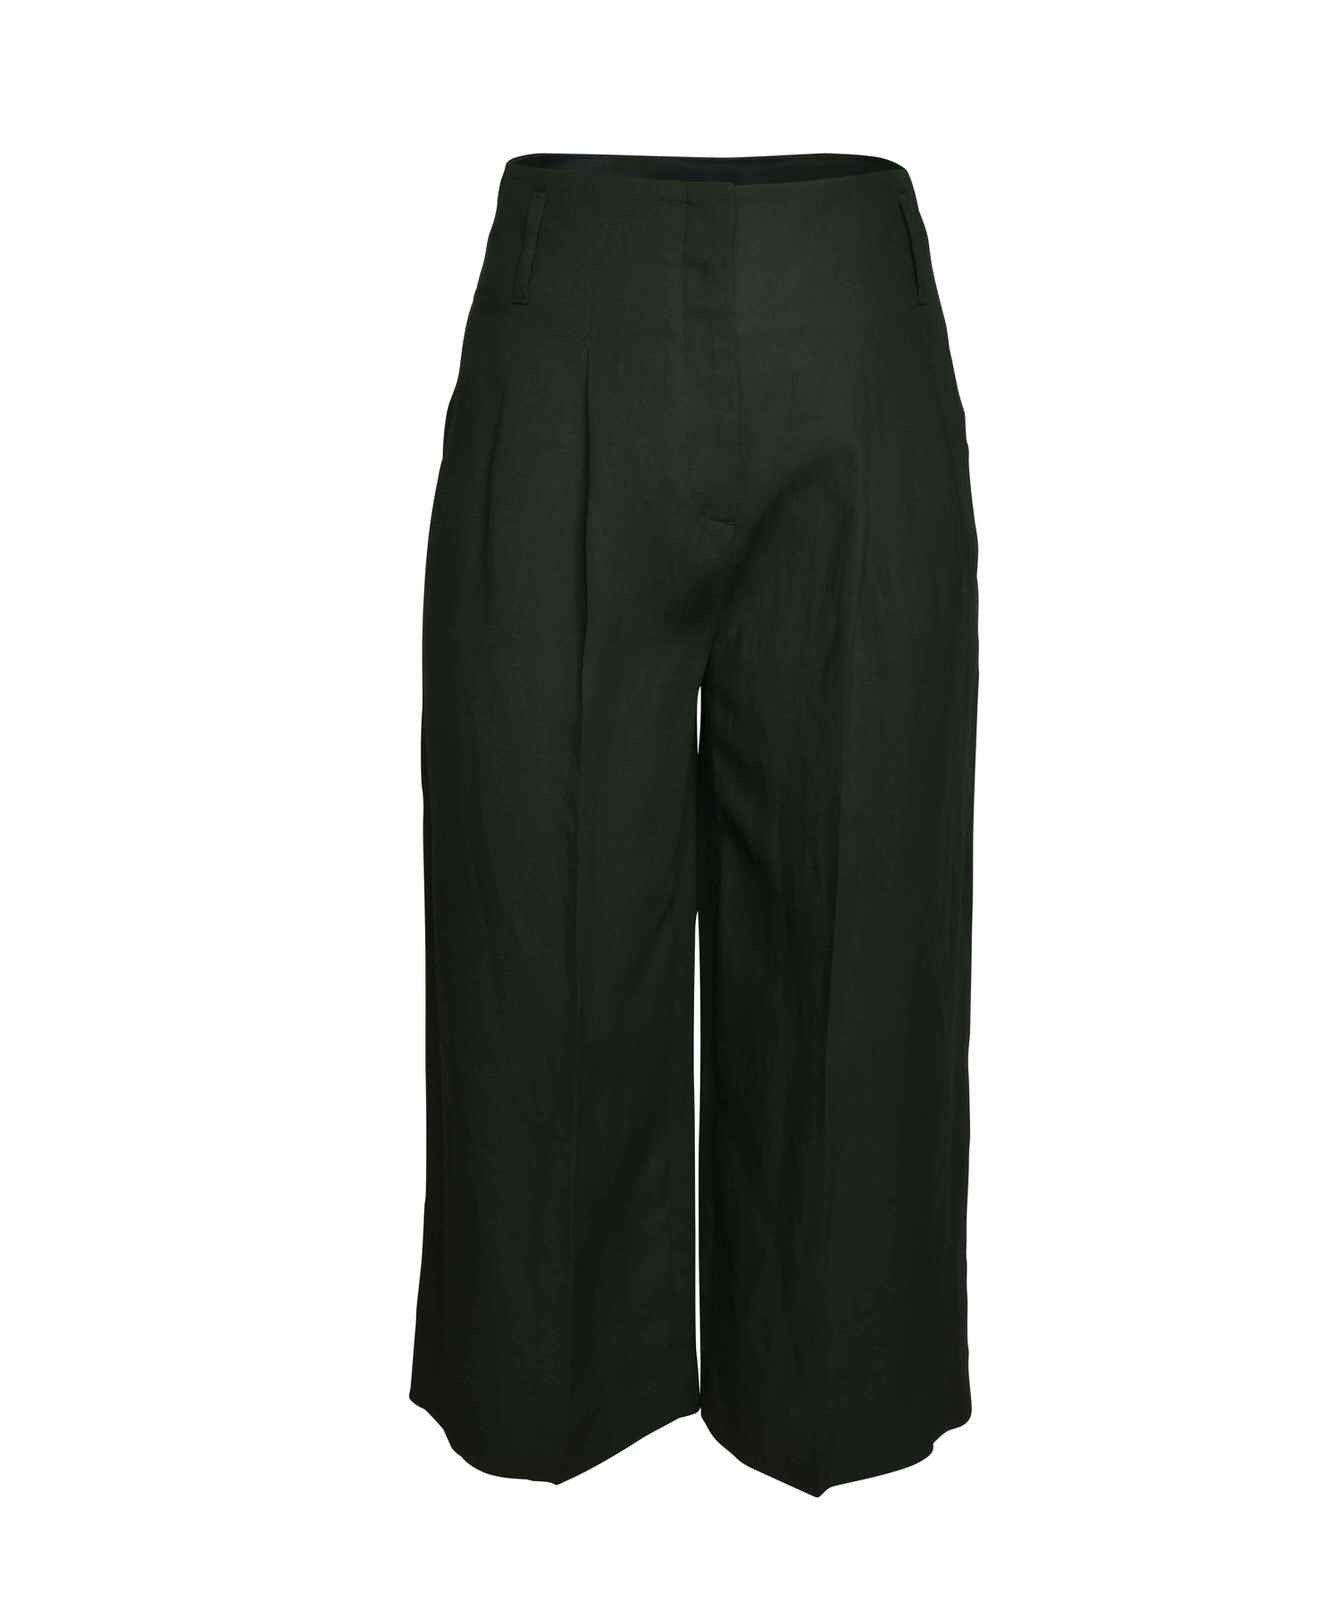 LUISA CERANO - Damen Hose - Wide Leg Pants - Thyme